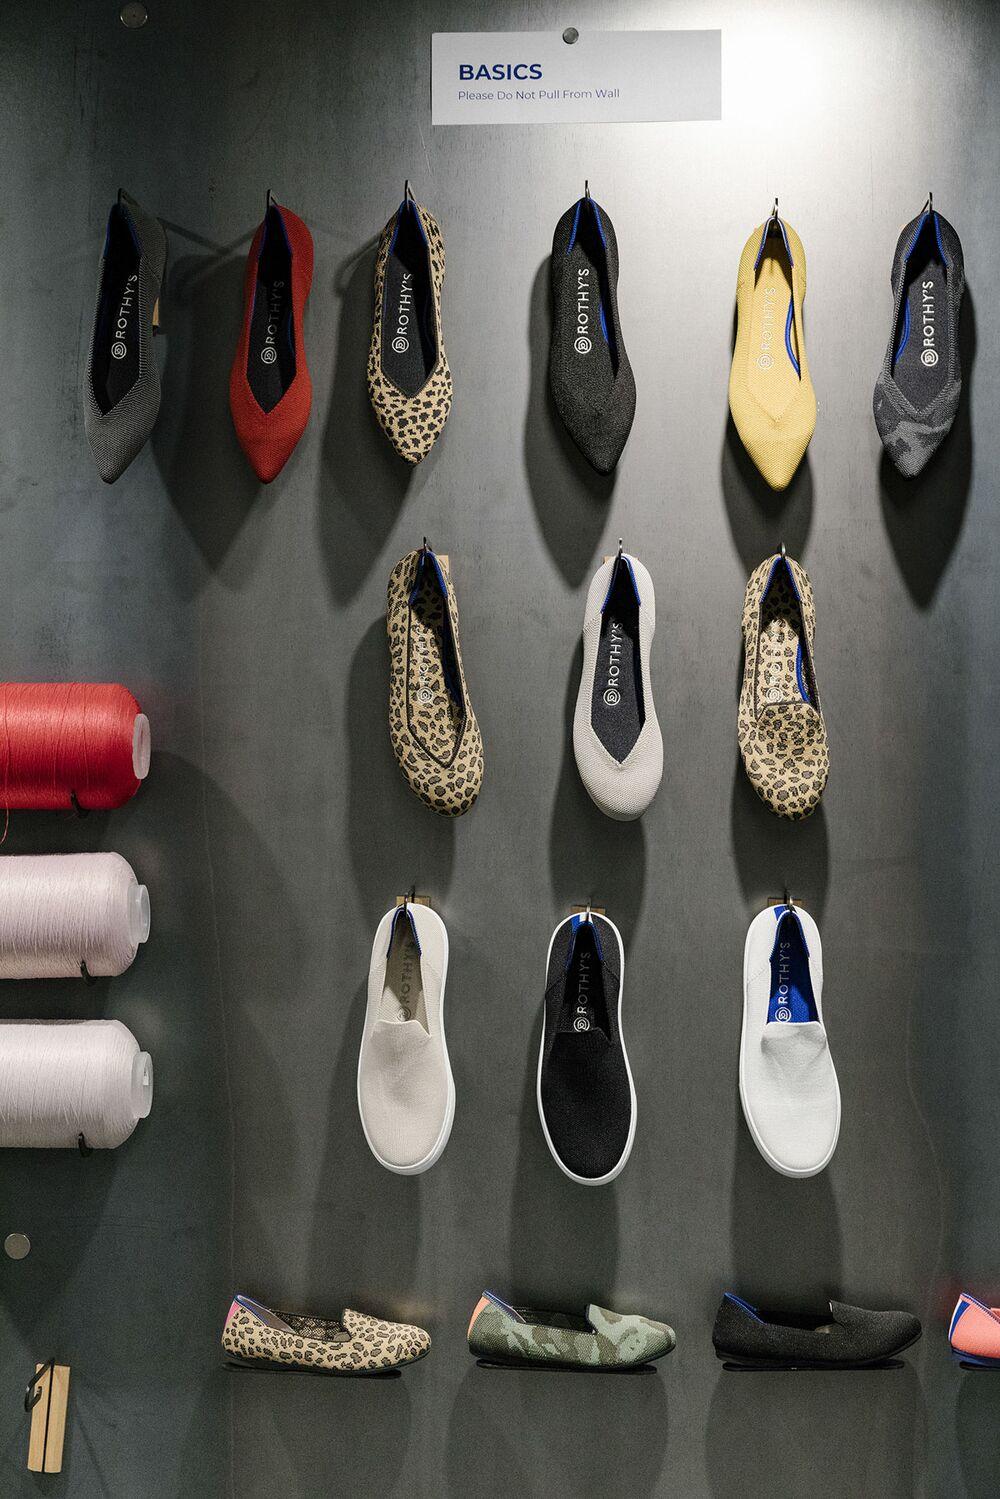 Instagram-Popular Shoemaker Rothy's